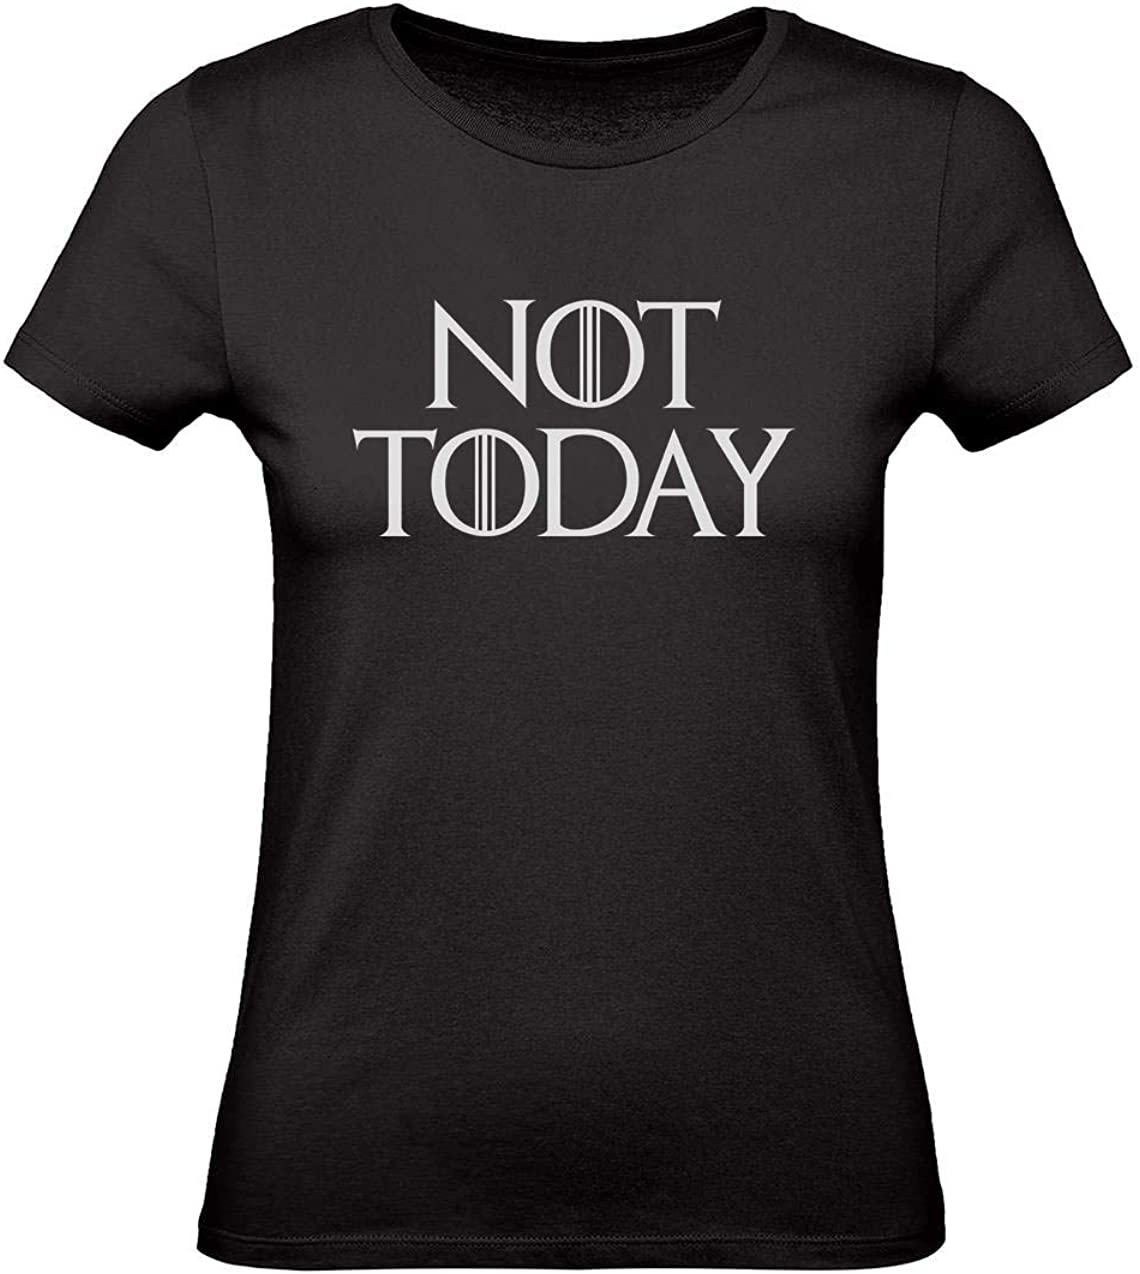 Green Turtle Camiseta para Mujer - Not Today